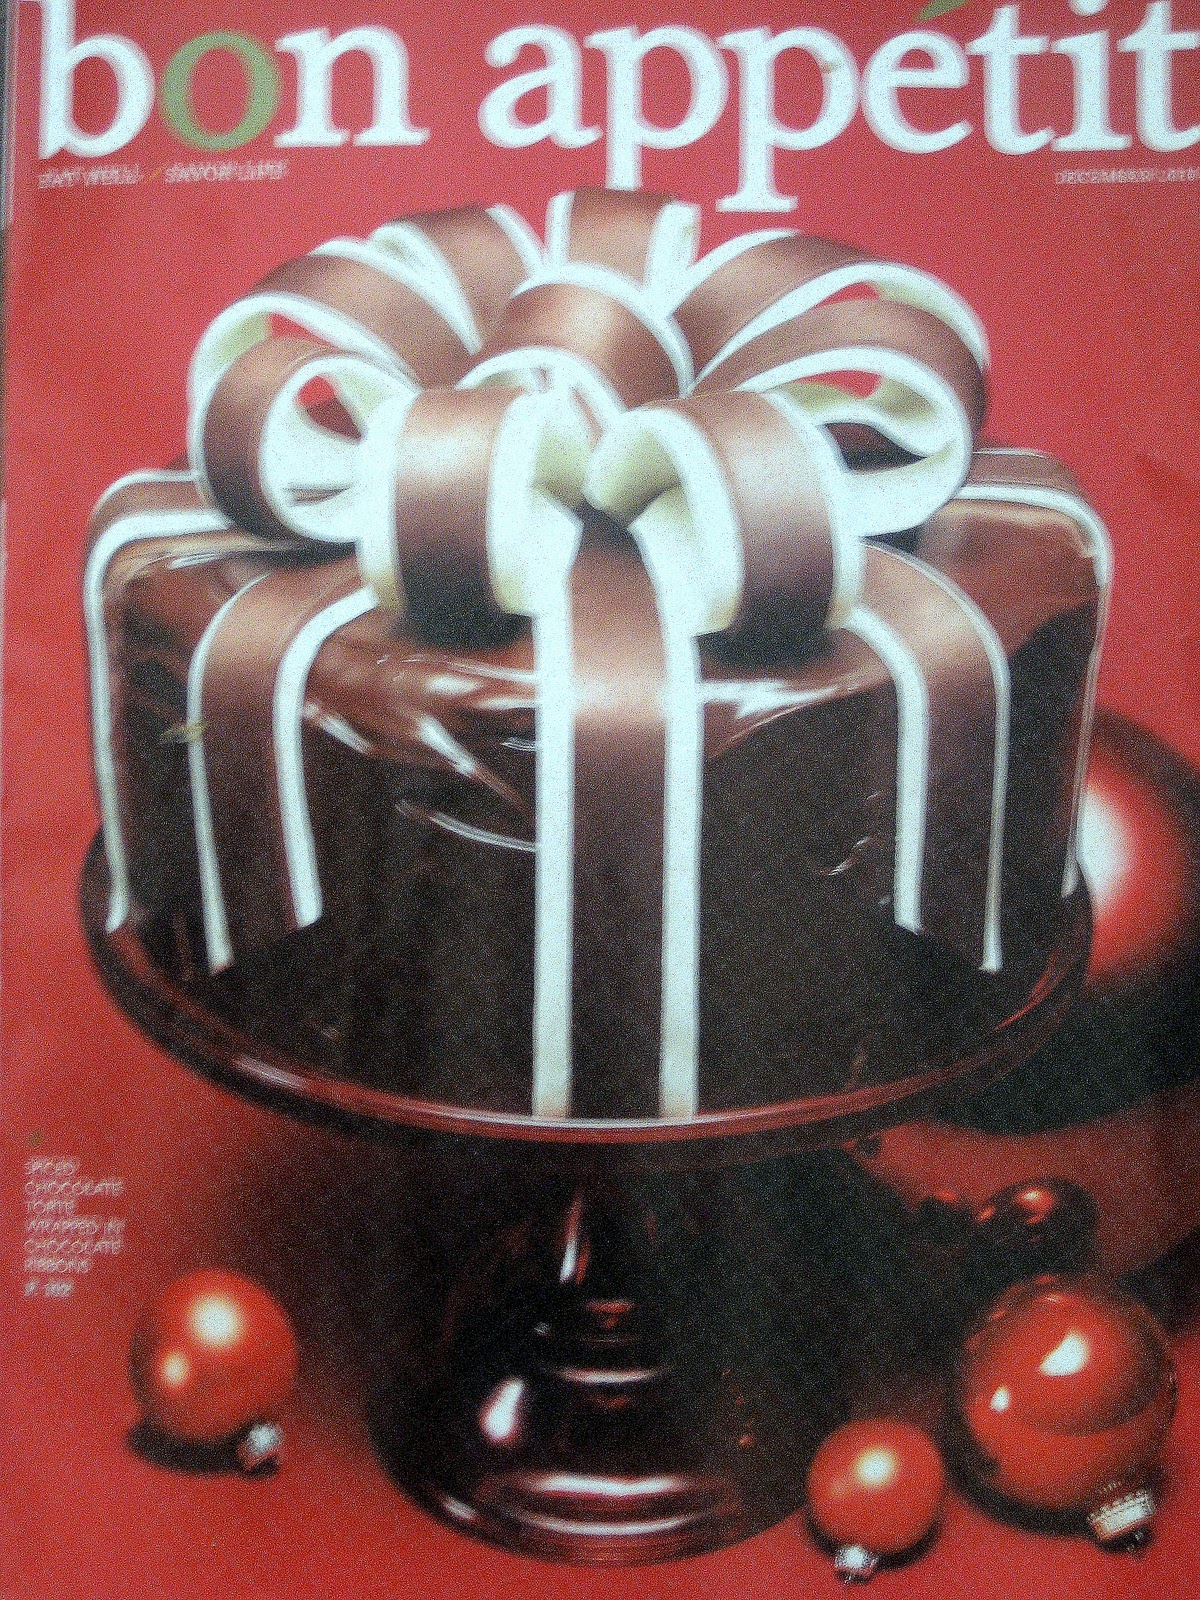 Bon Appetit Magazine Covers Up my december bon appetit